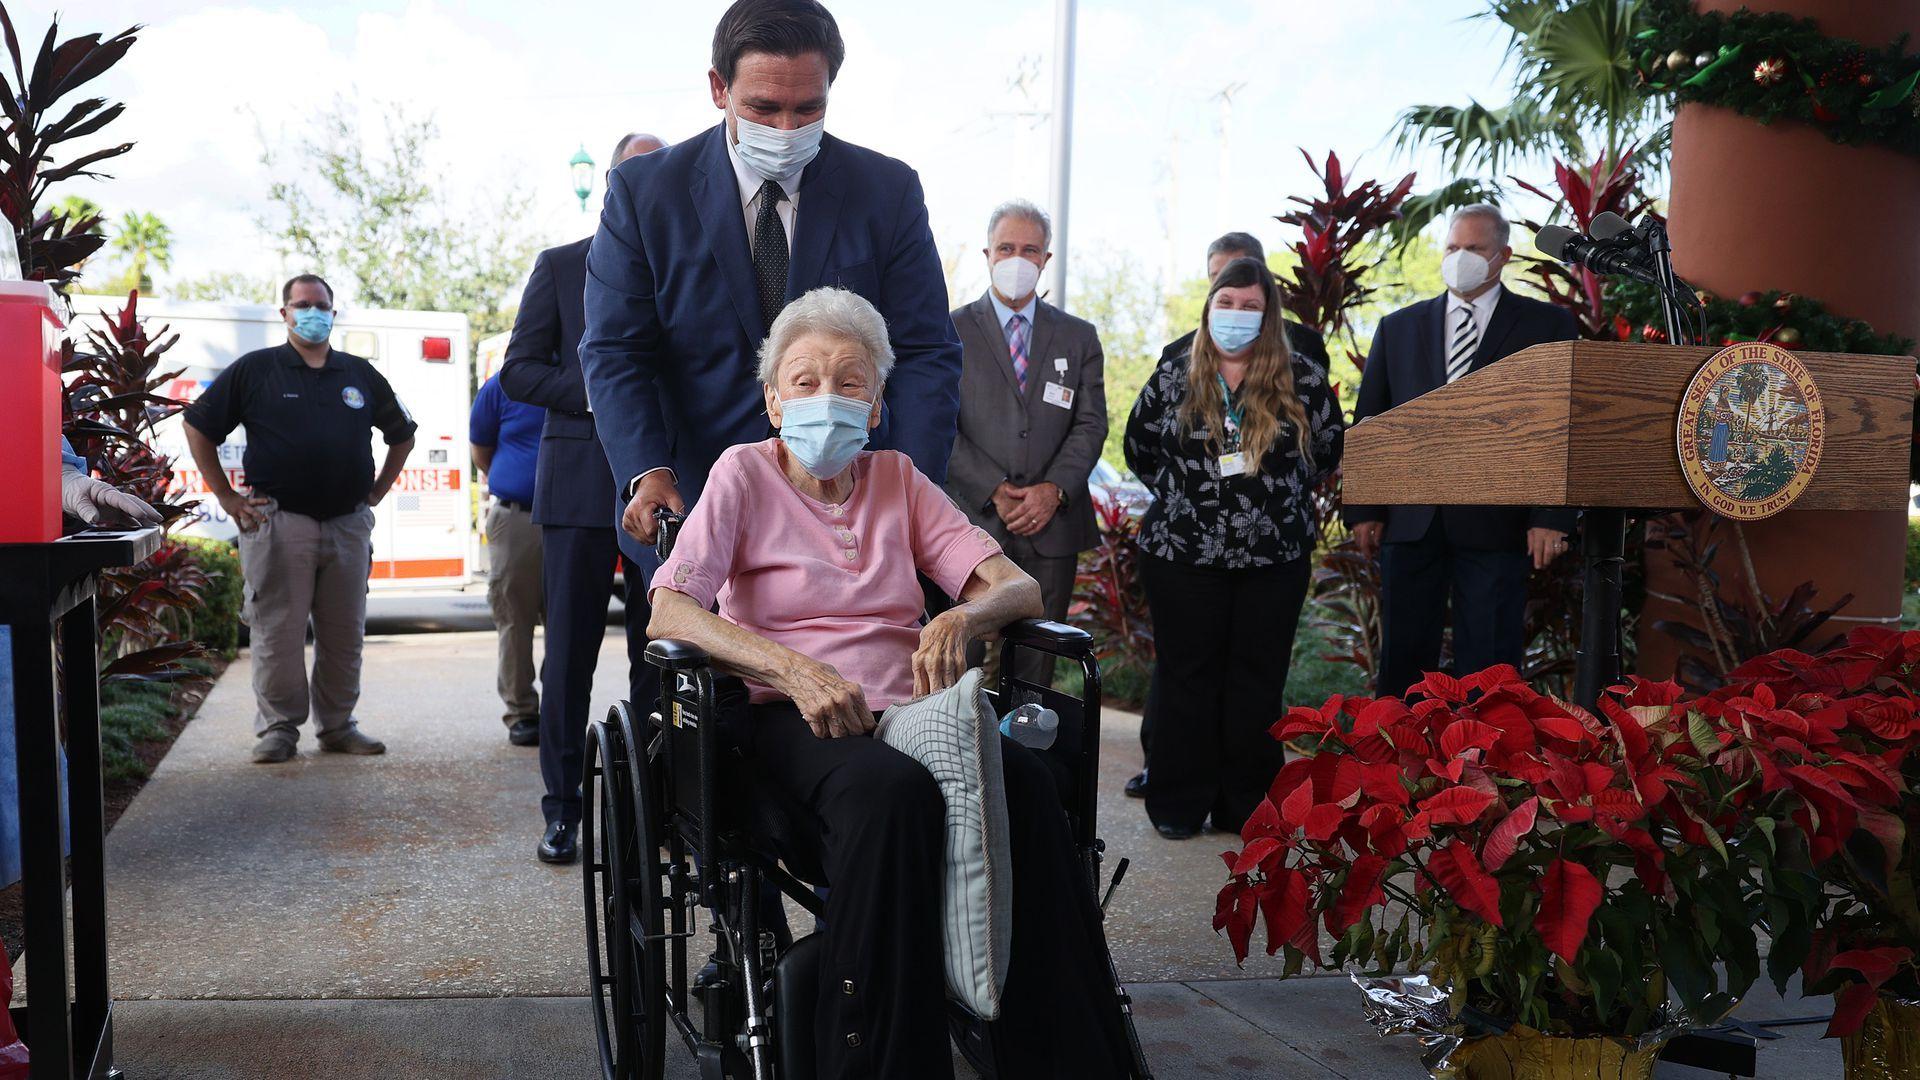 Florida Gov. Ron DeSantis pushes a woman in a wheelchair